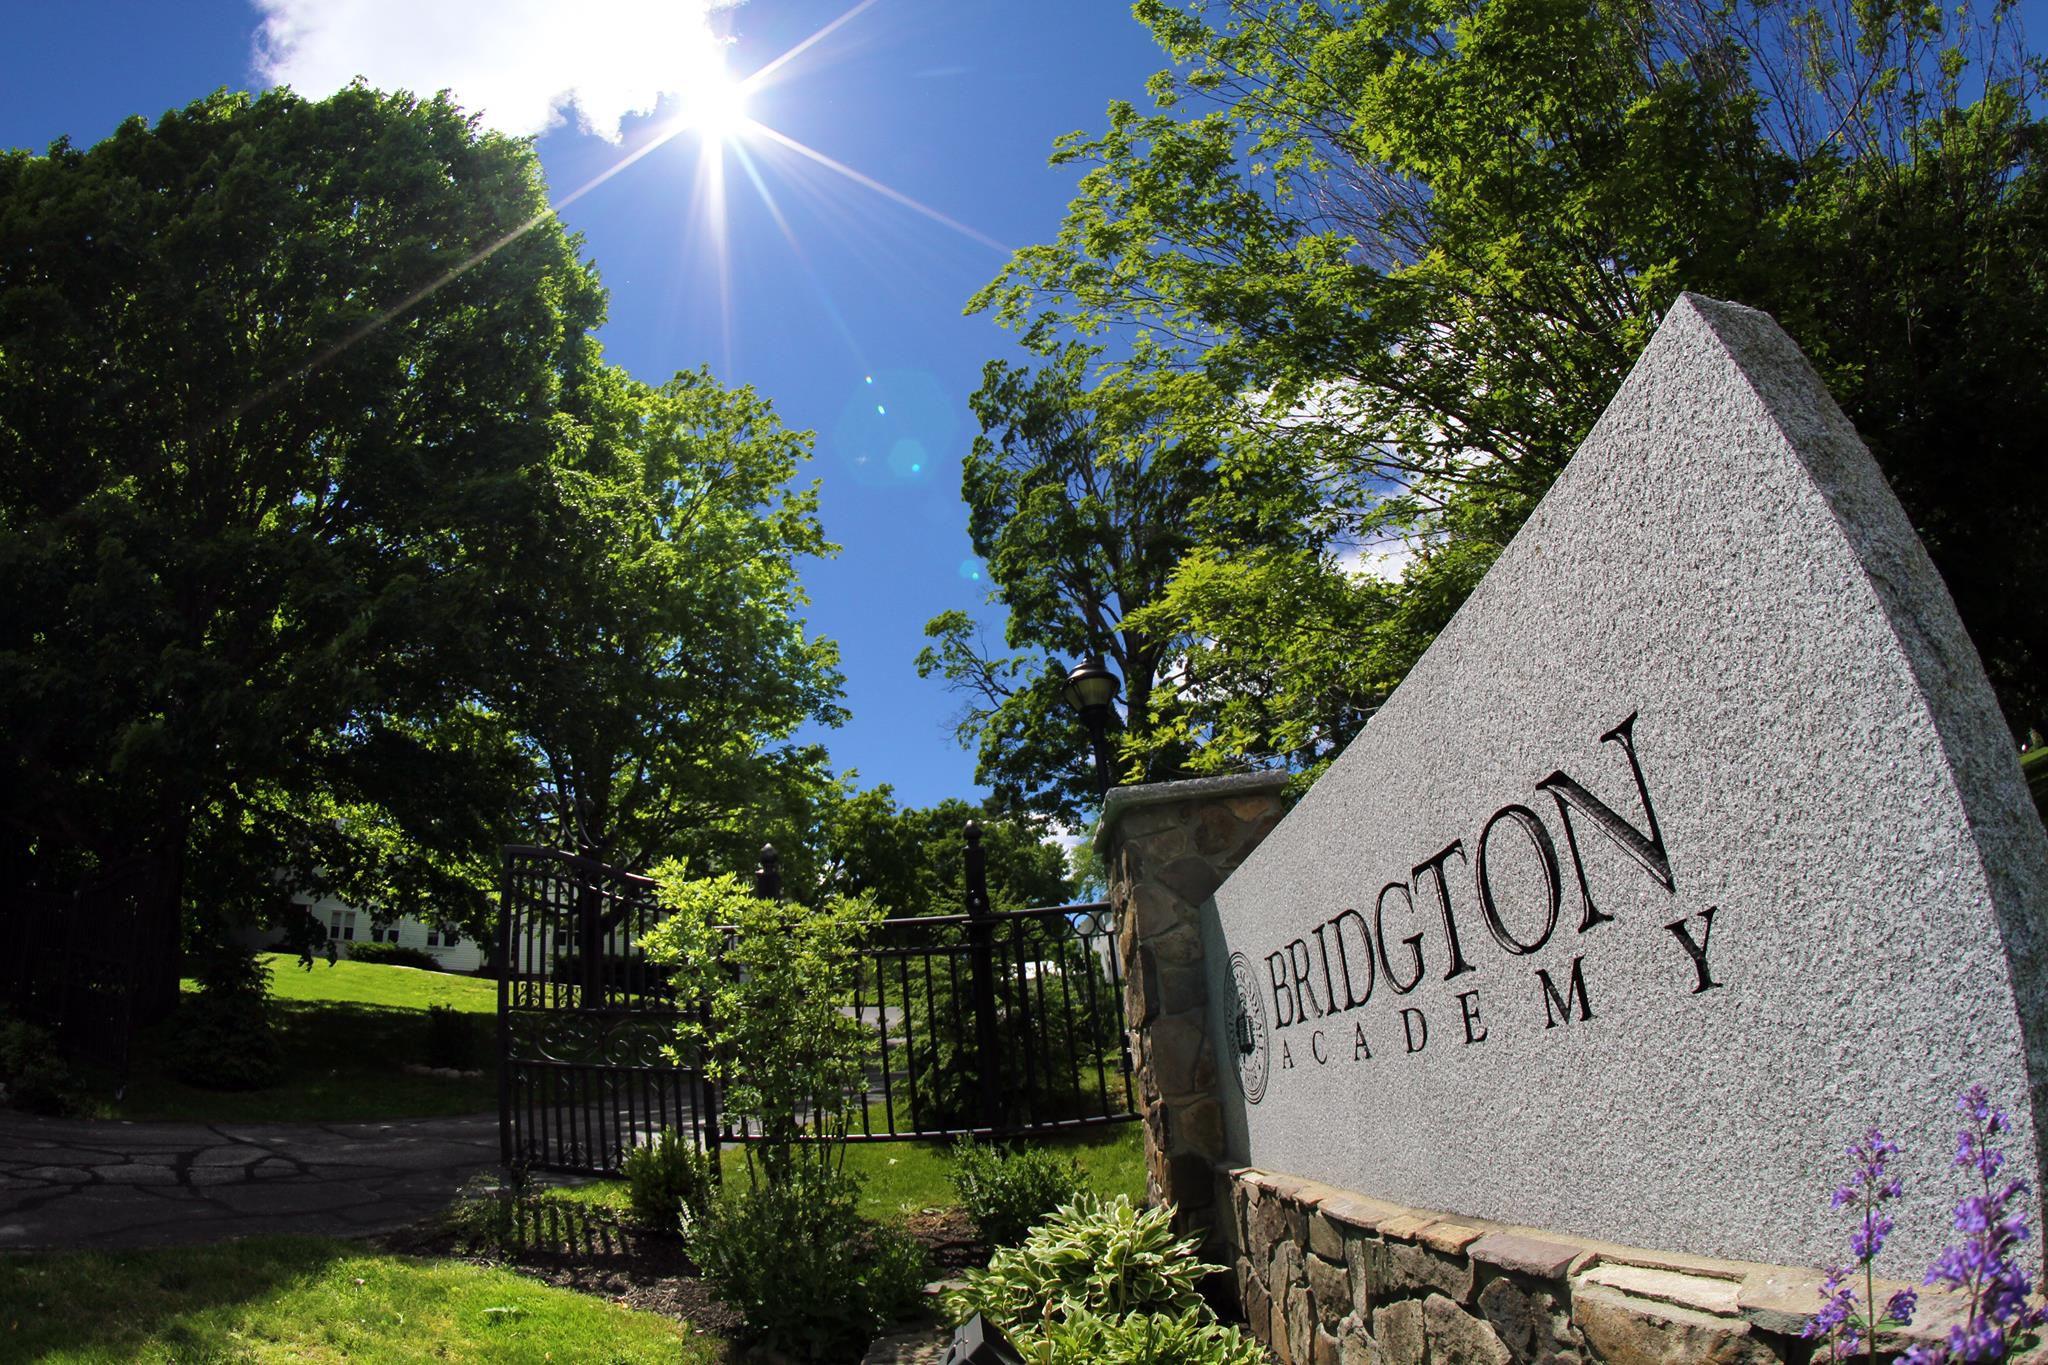 Bridgton Academy sign